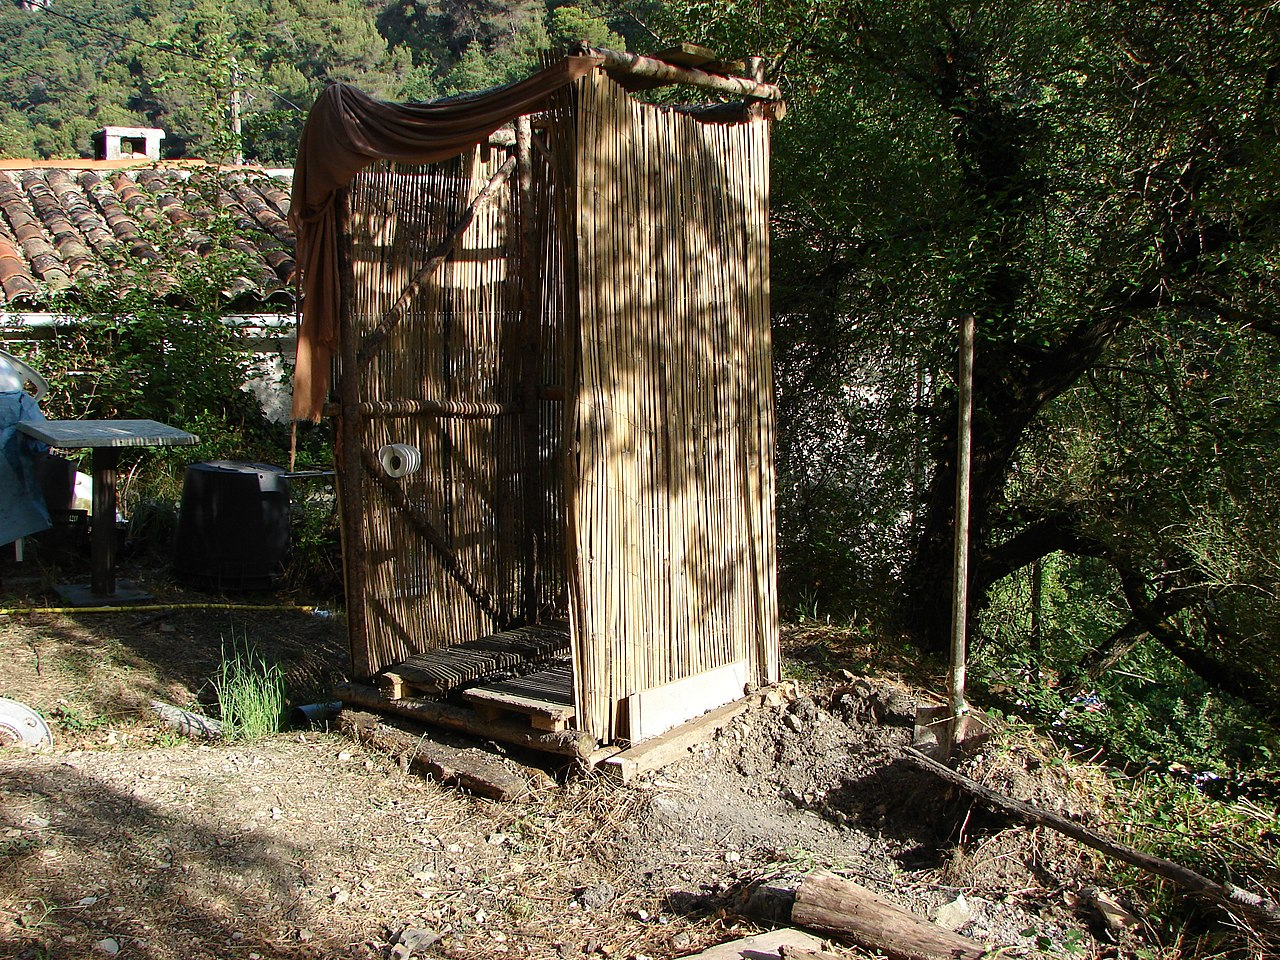 File:Composting toilet Toilettes sèches en plein air WC ecolo Cabane ...